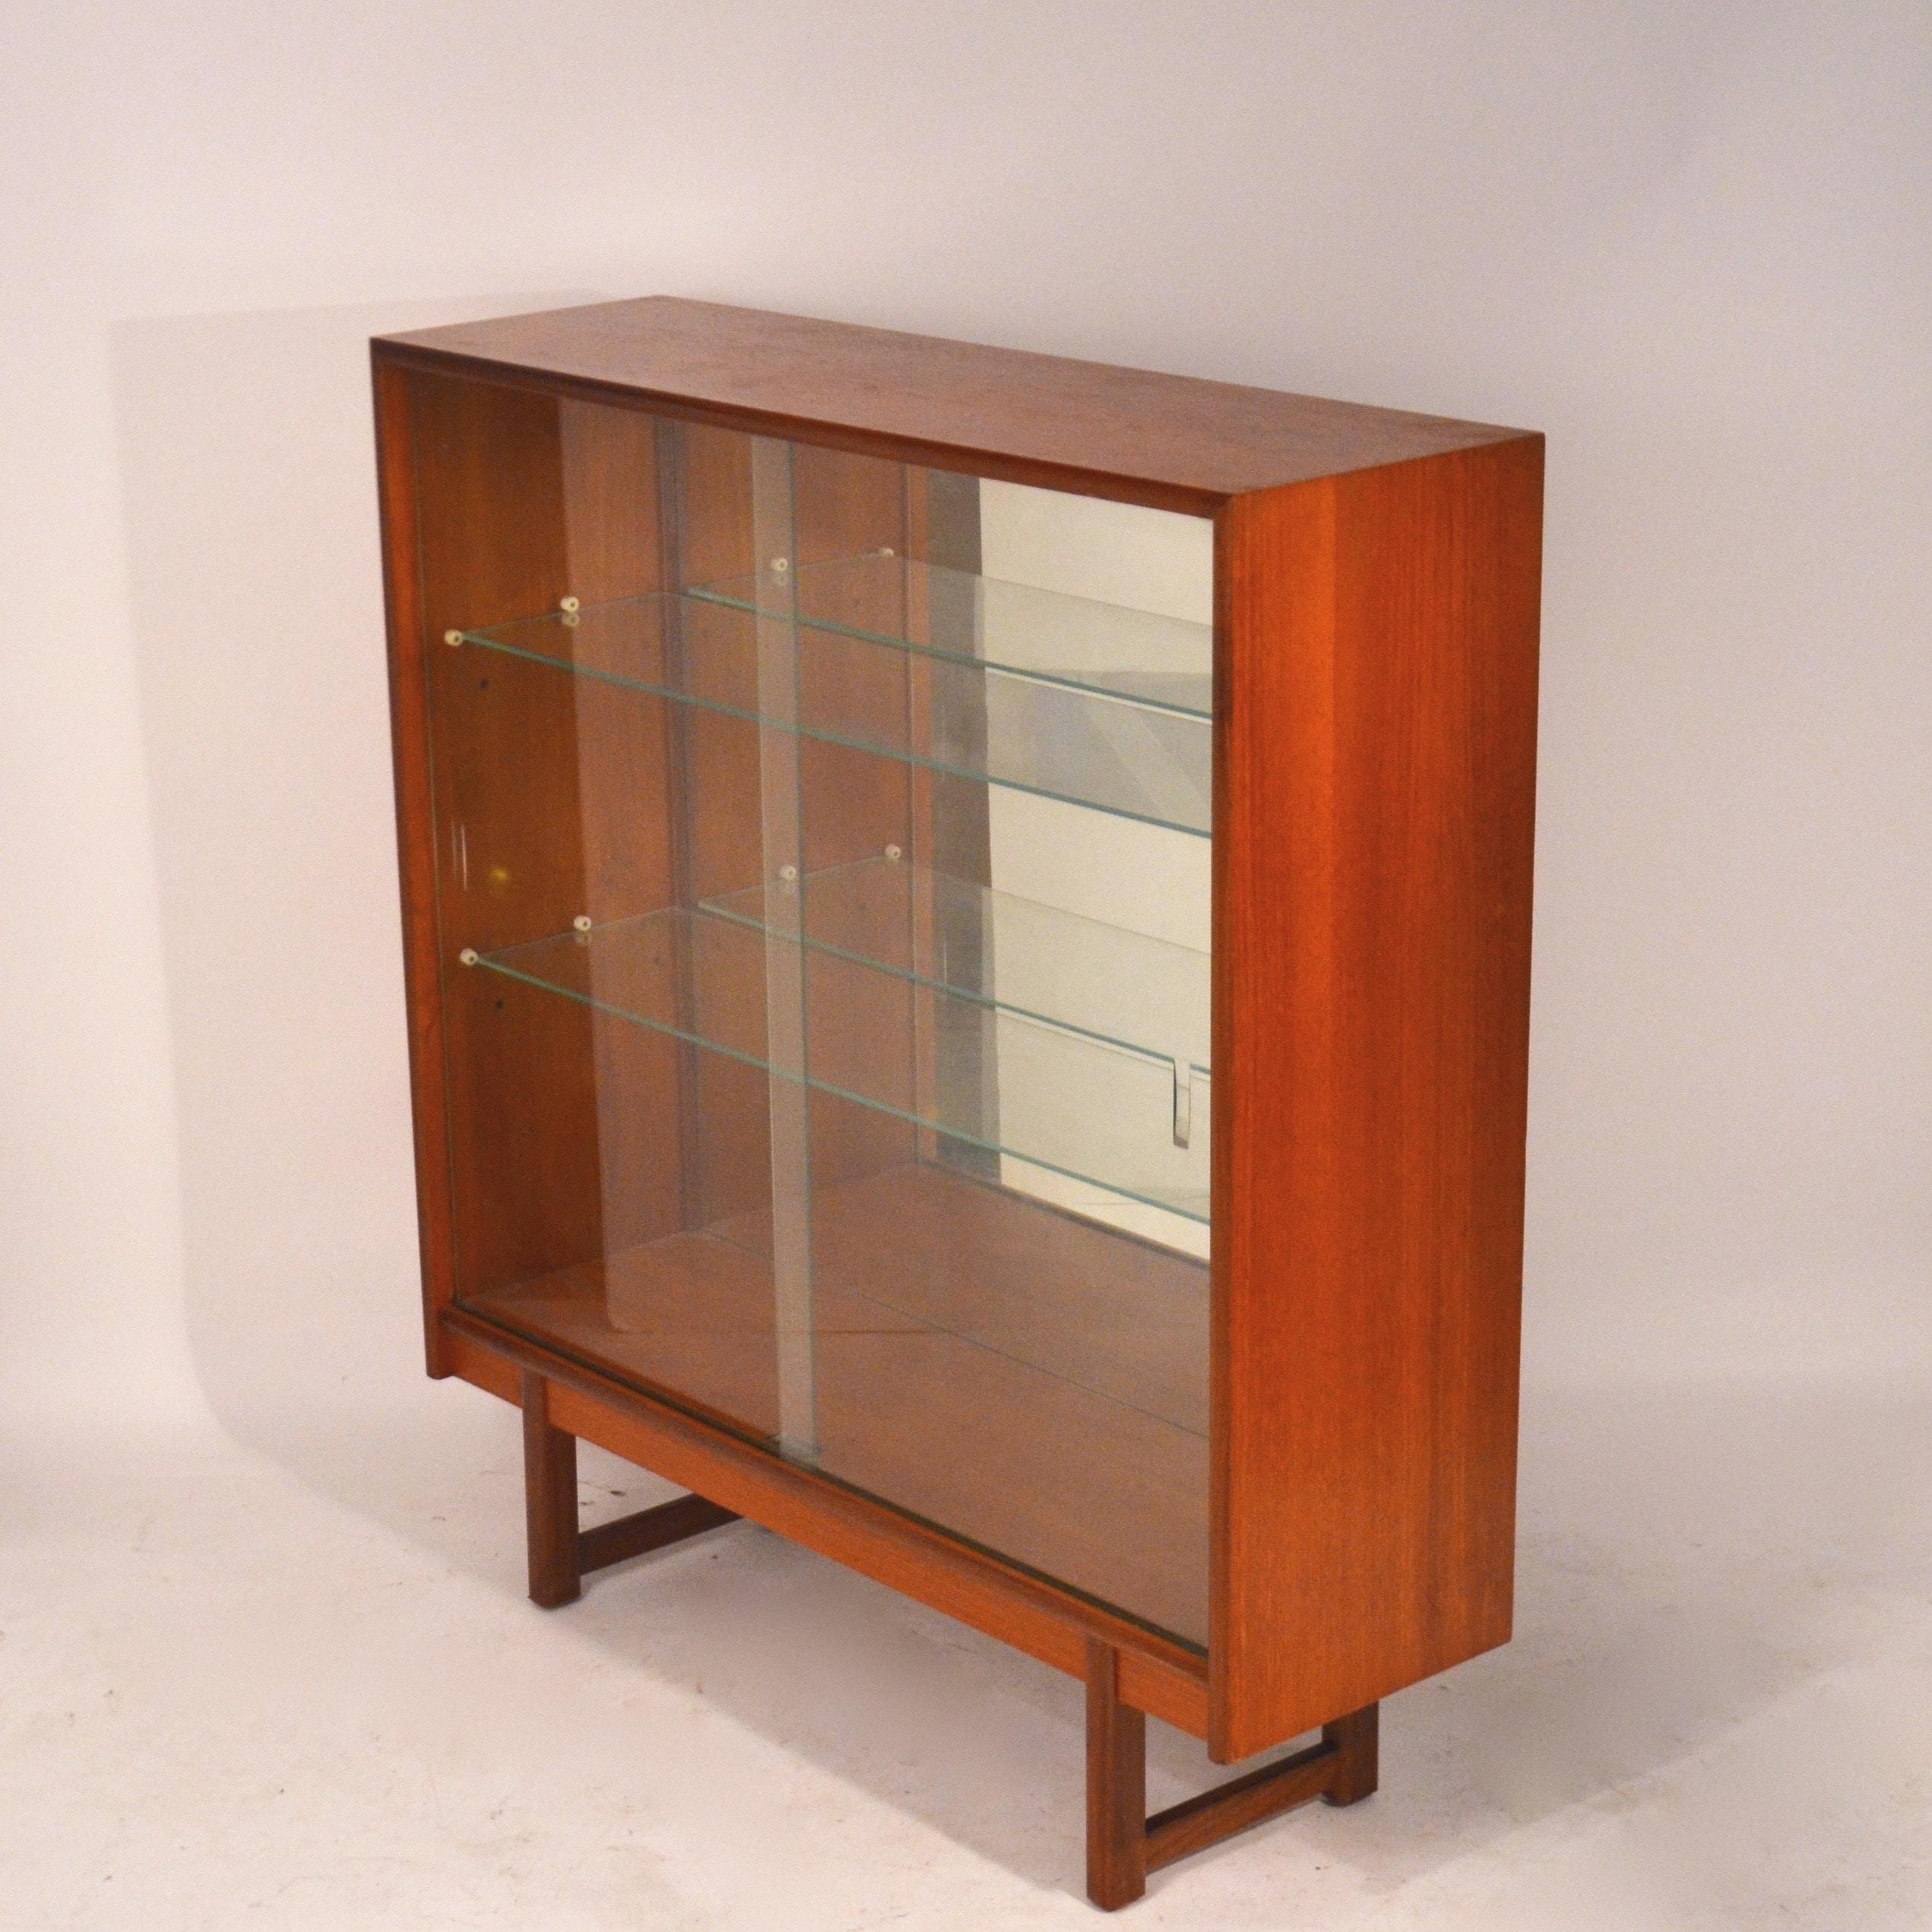 biblioth que vitrine ann es 60 bindiesbindies. Black Bedroom Furniture Sets. Home Design Ideas